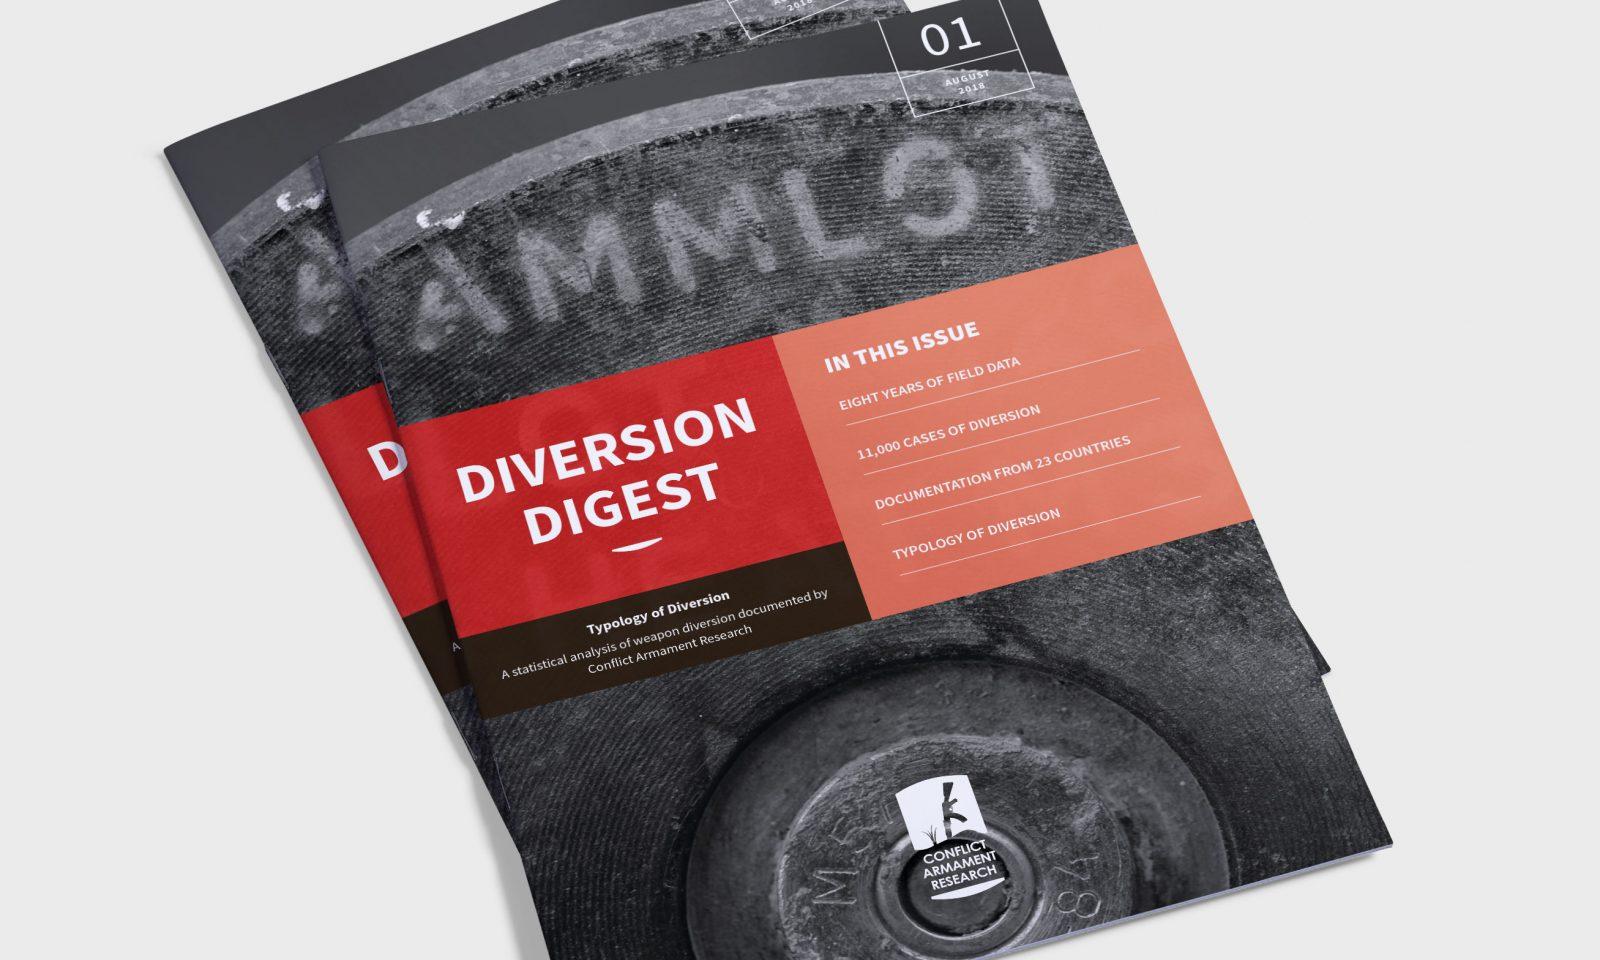 Diversion Digest cover